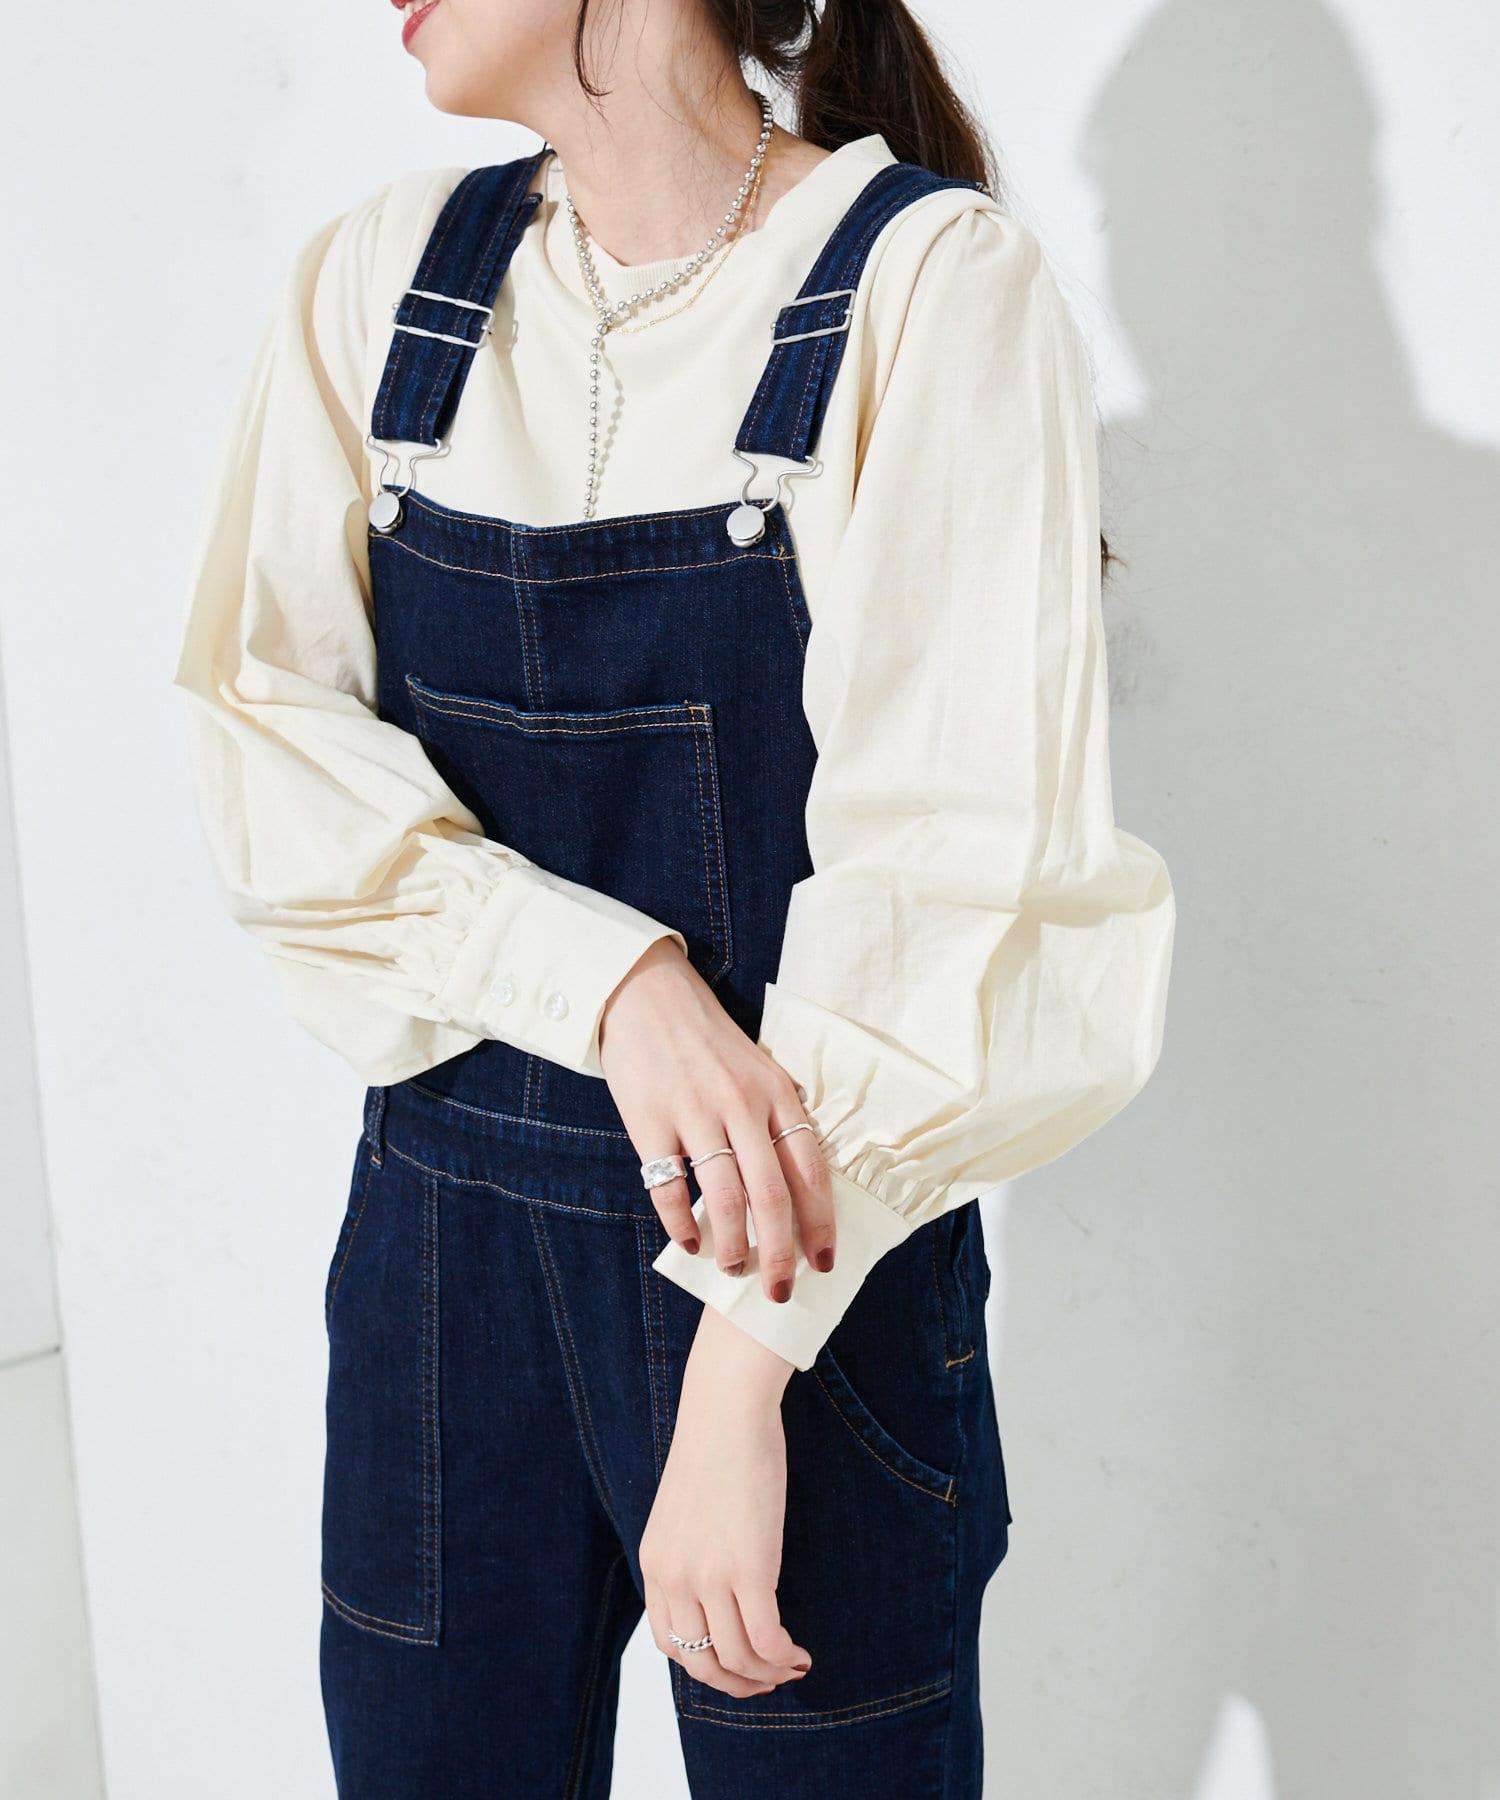 OUTLET(アウトレット) 【Discoat】レイヤード袖切替ショート丈スウェット